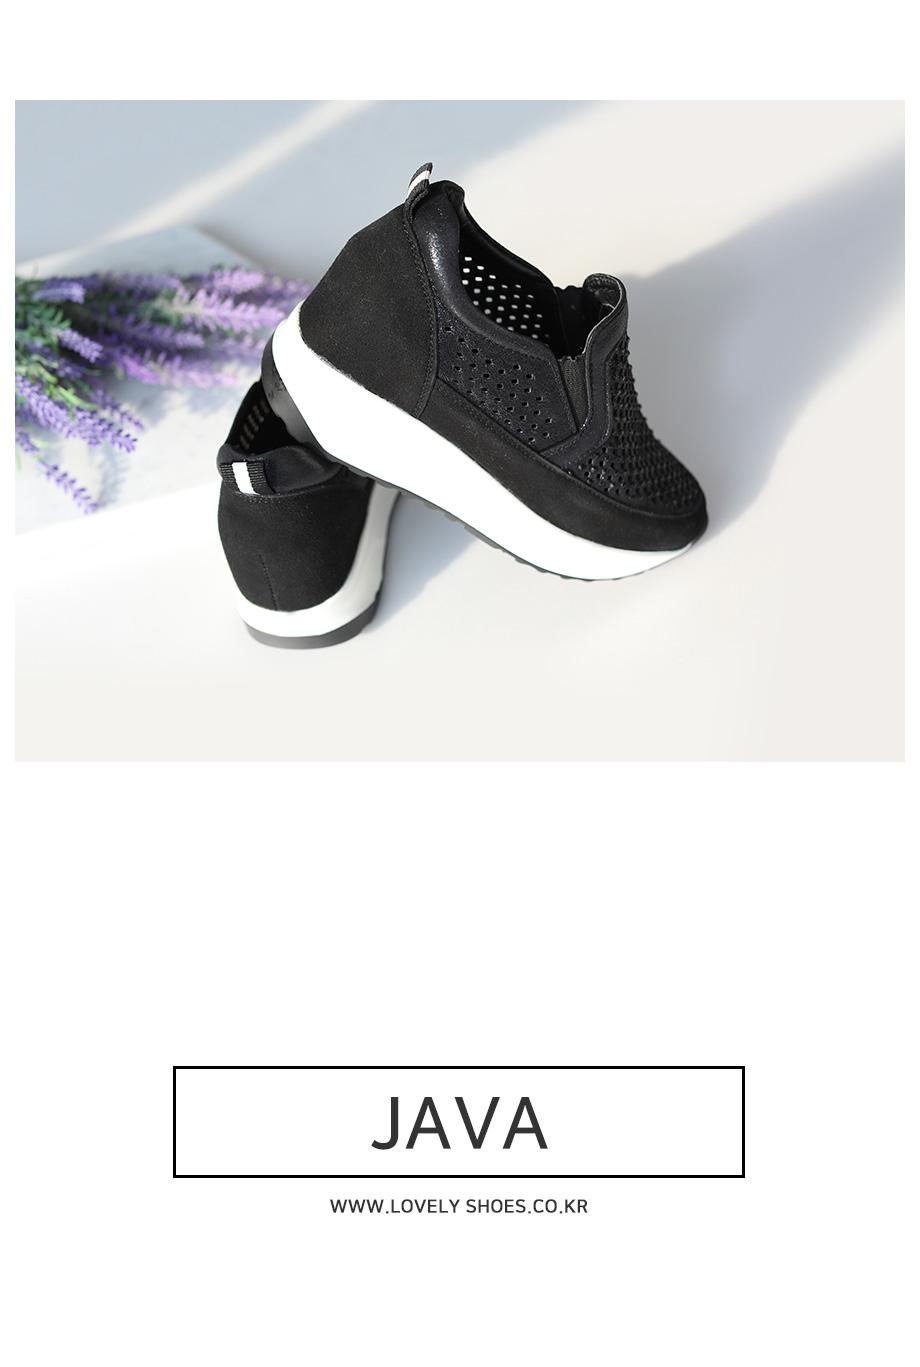 Java punching key height slip-on 6.5cm39,900 -> 34,900 won